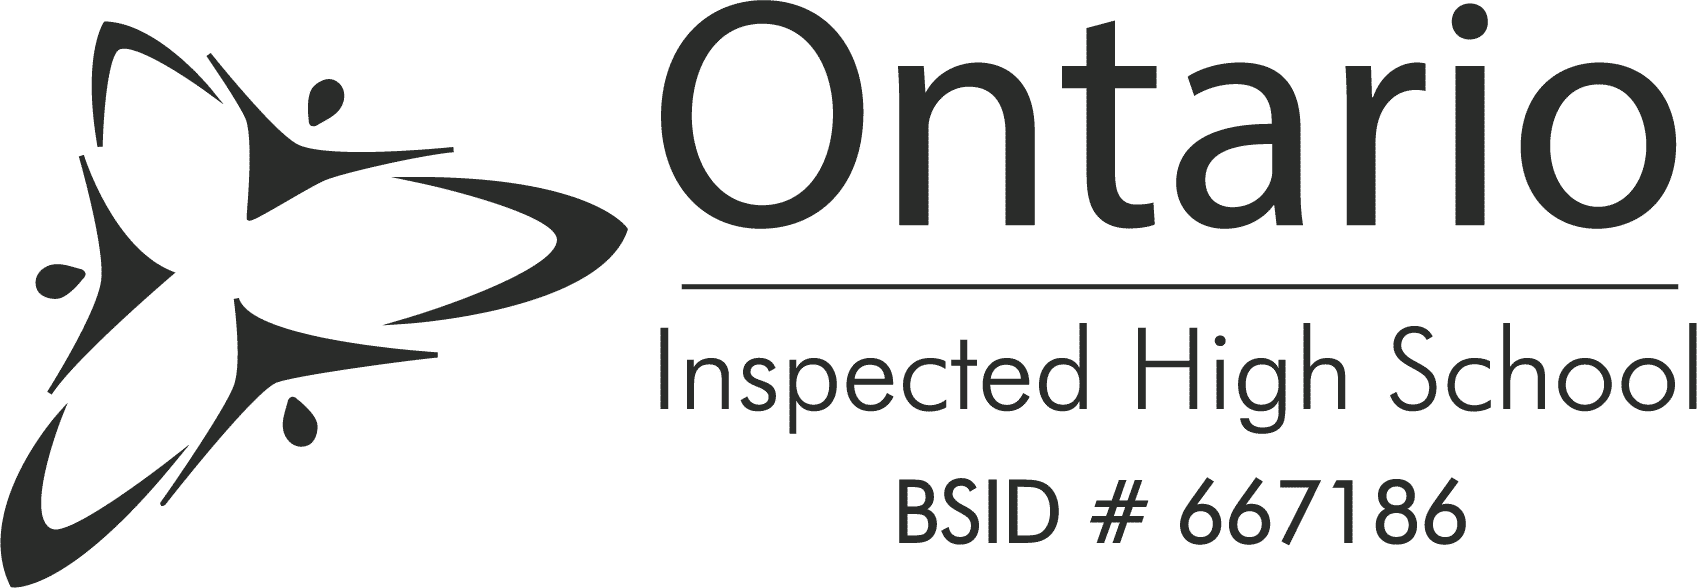 Individual Education Plan (IEP) - Ontario eSecondary School